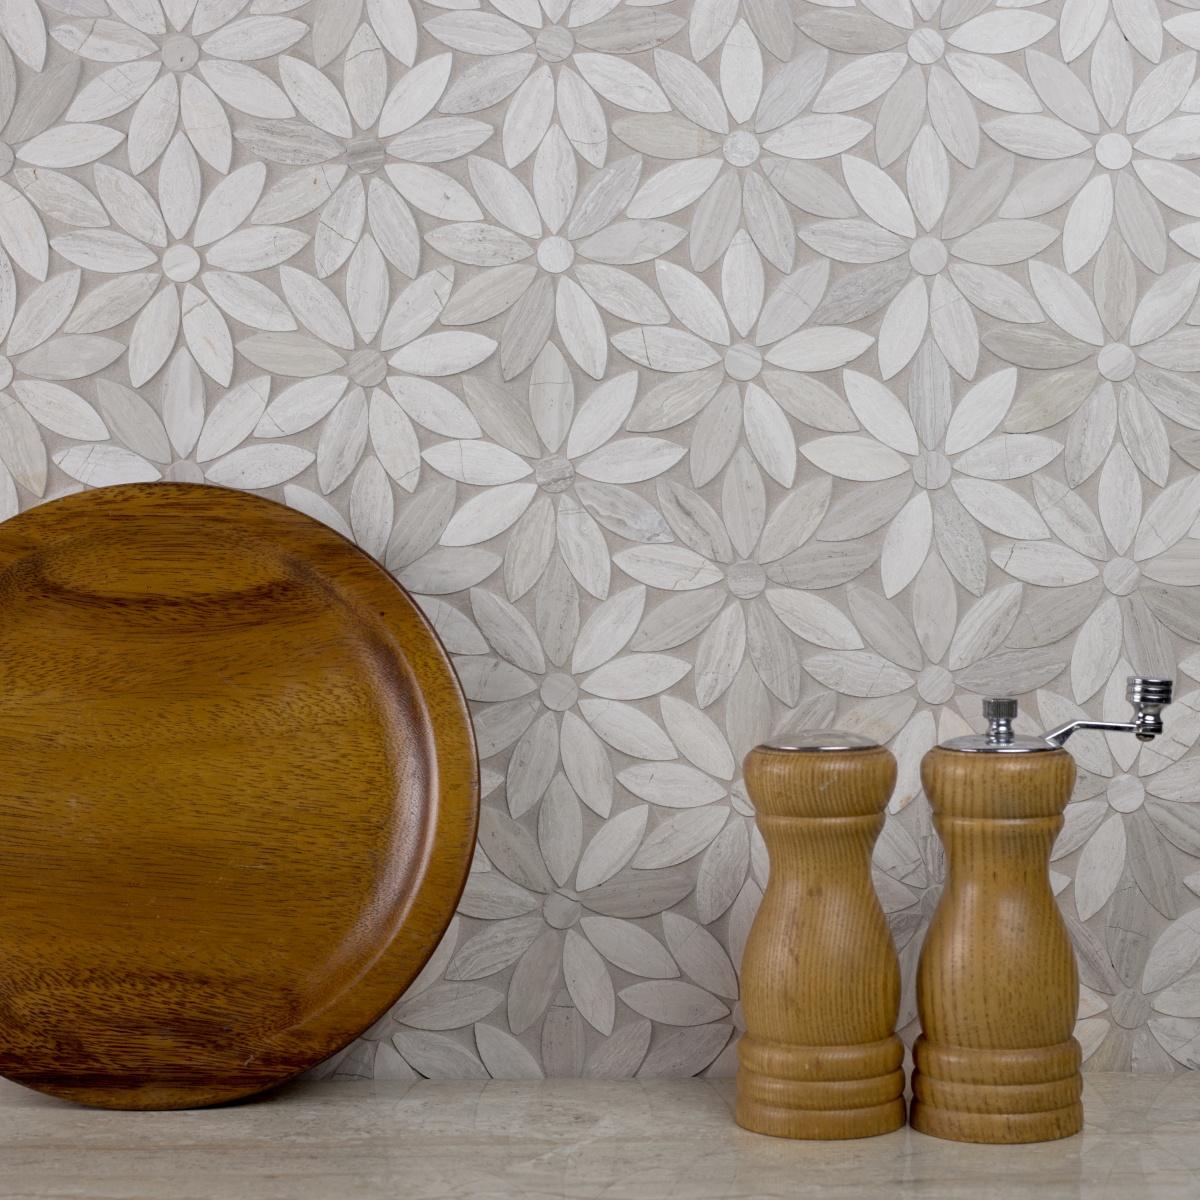 Marble 4 In X 4 In Marble Flower Waterjet Mosaic In Royal